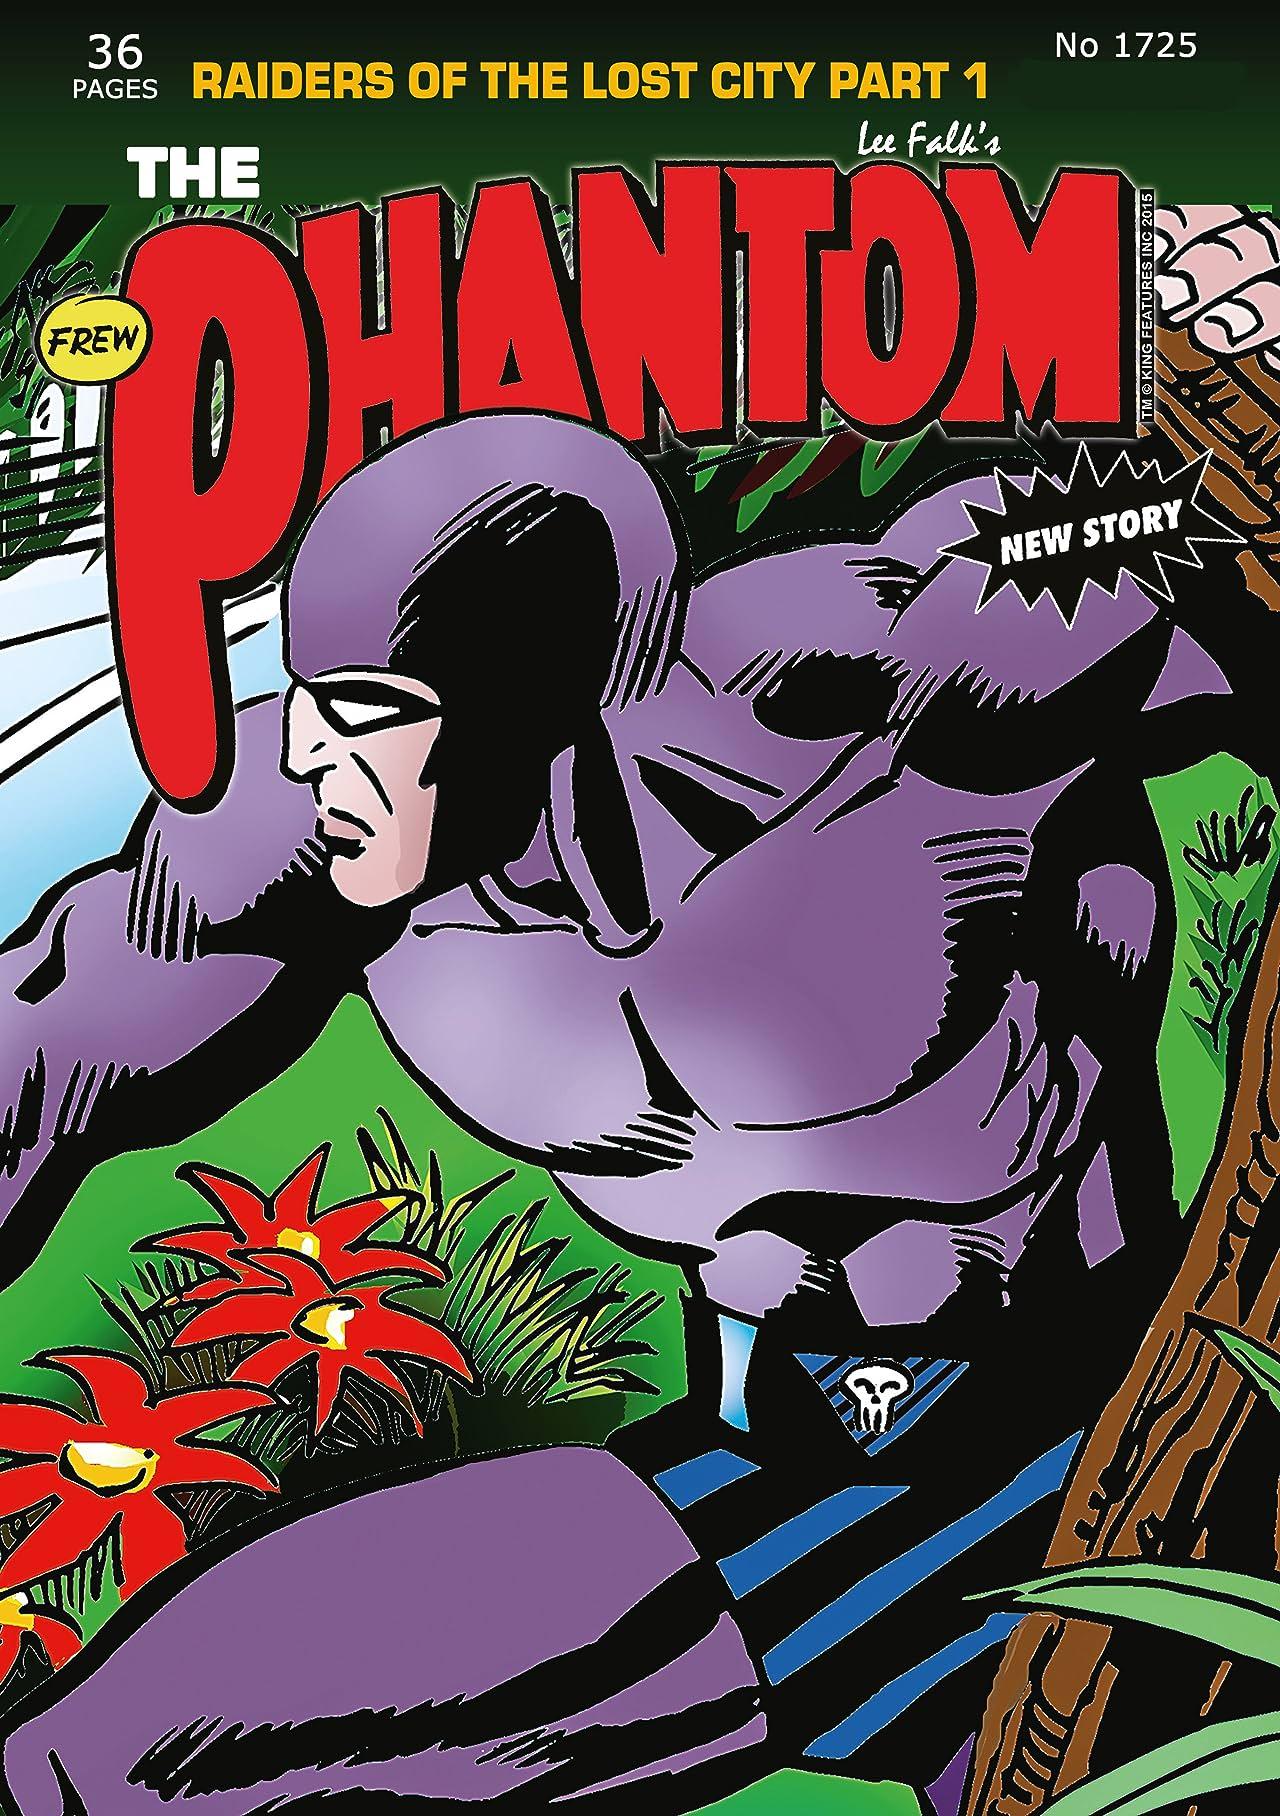 The Phantom #1725